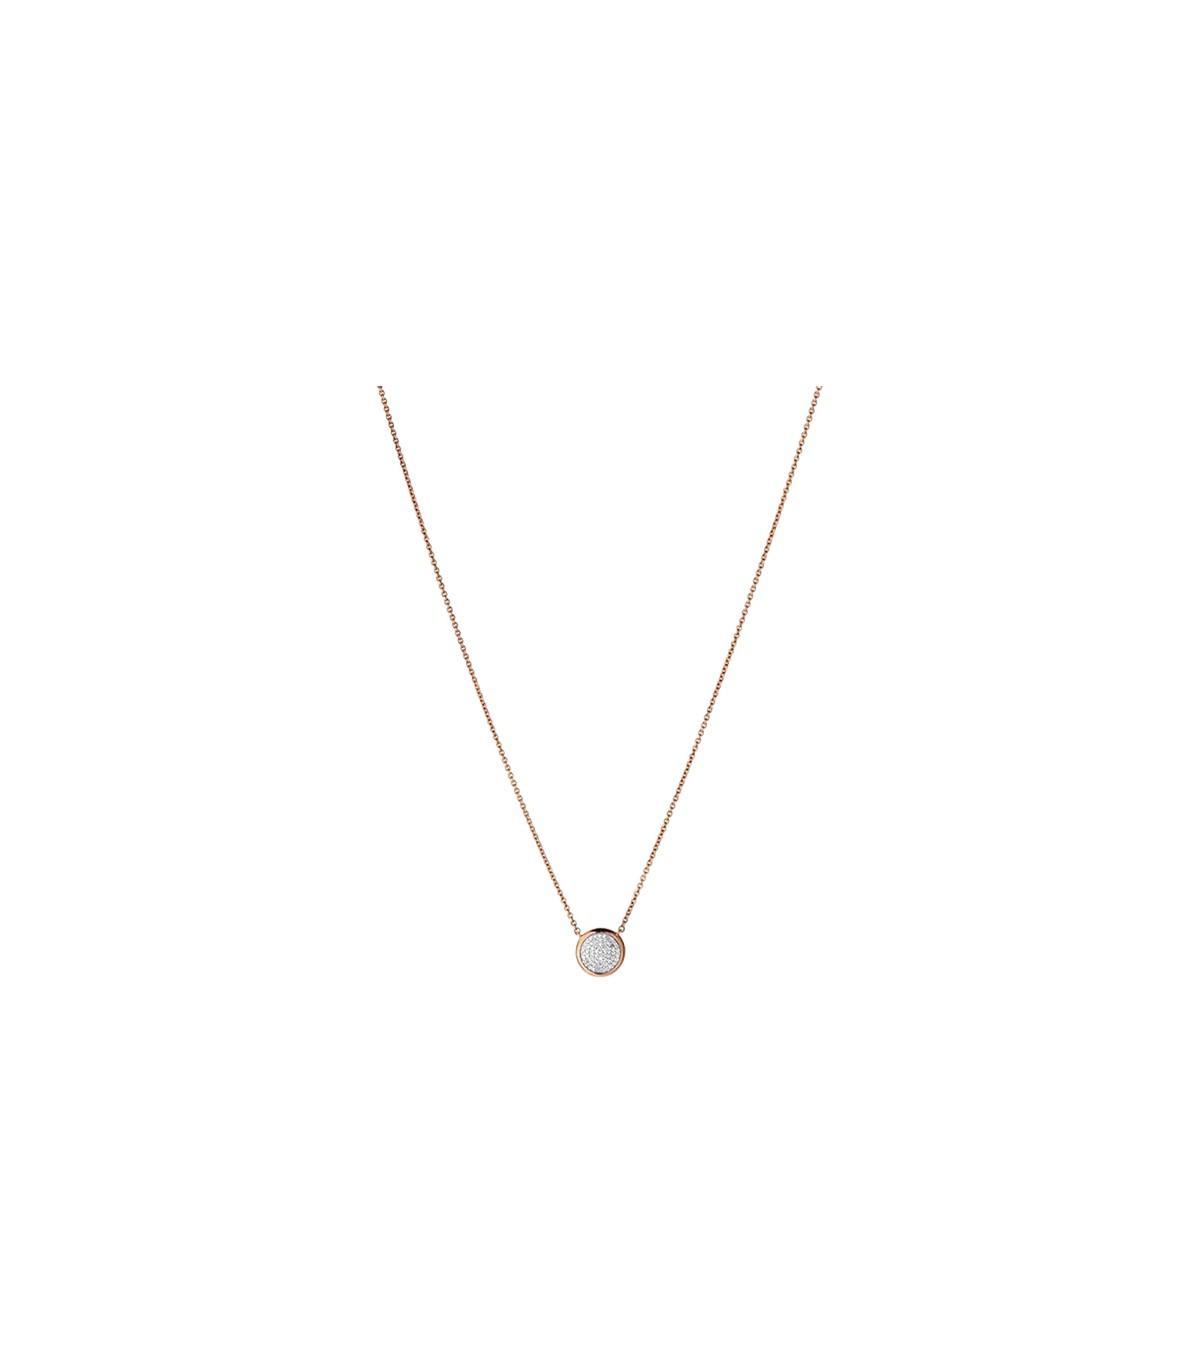 ba9cf8e22724 Diamond Essentials RGP Vermeil & Diamond Pave Necklace - 5020.2726